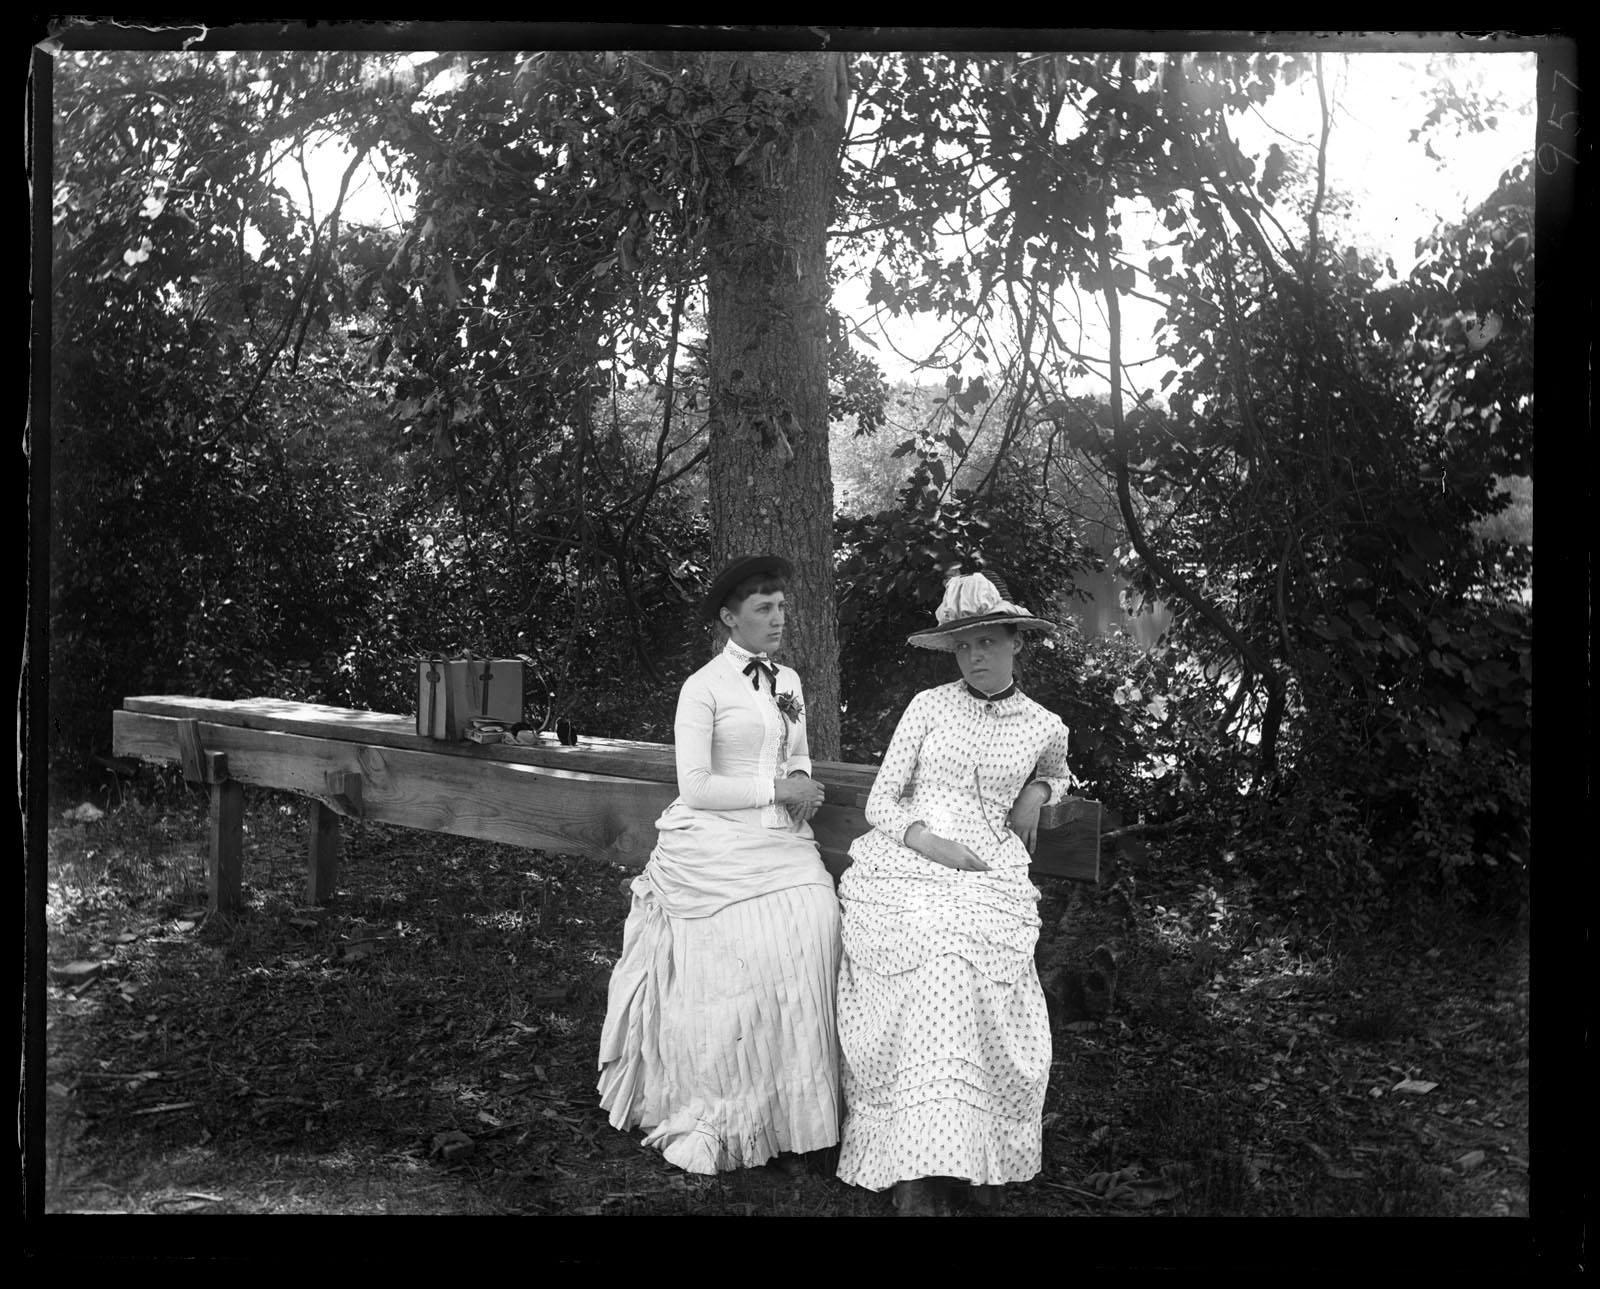 Marriott Canby Morris. Alice Shipley & Bessie in Woods Near Overflow. [Sea Girt, NJ], 1886. Glass negative. Marriott C. Morris Collection. [P.9895.957]